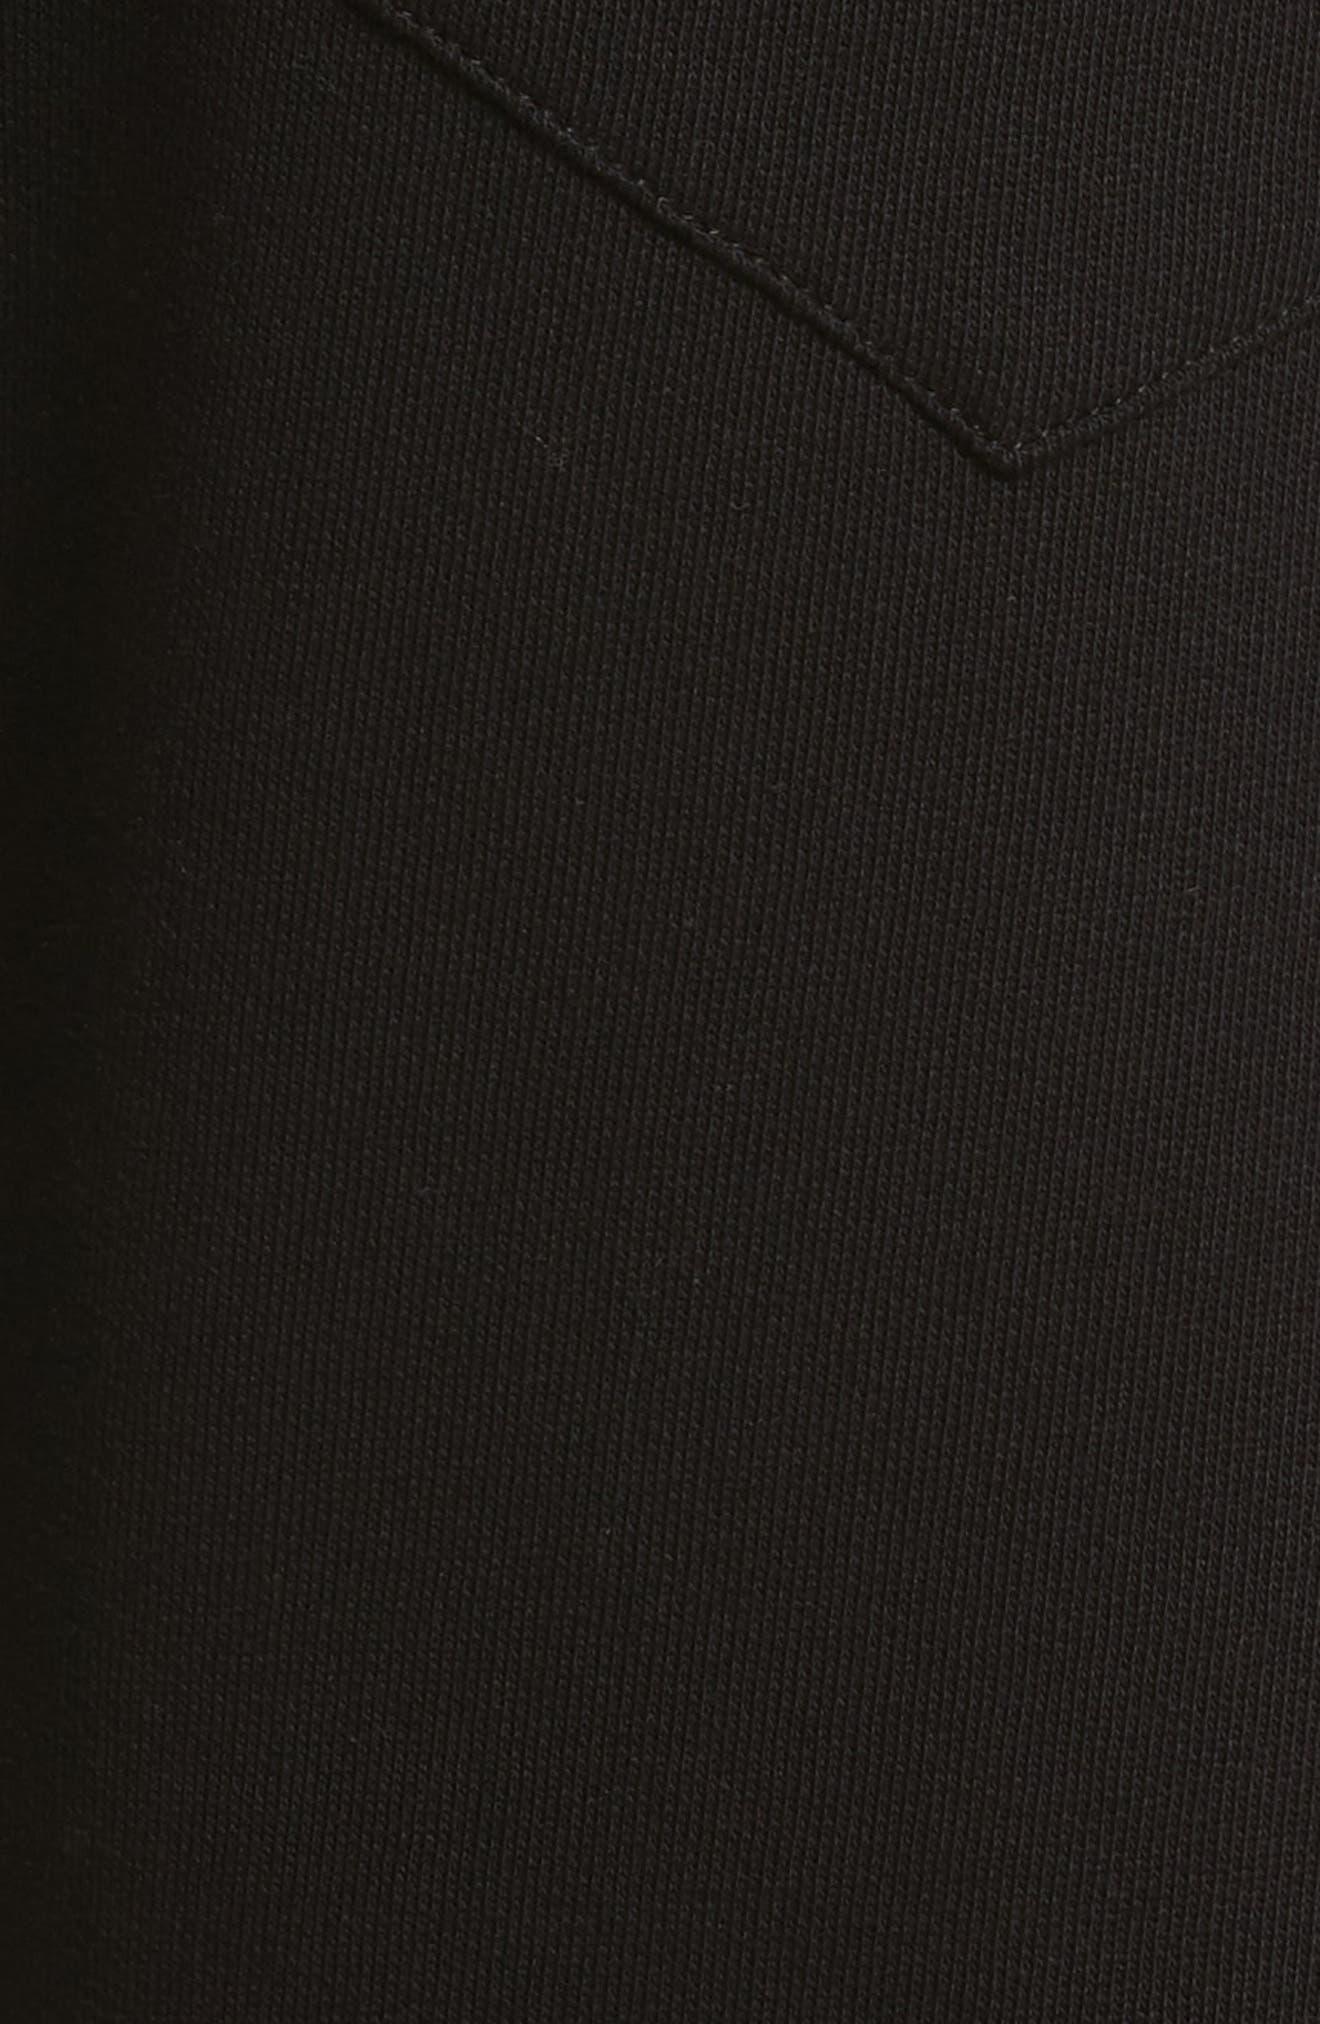 Medusa Embroidered Jogger Pants,                             Alternate thumbnail 5, color,                             BLACK